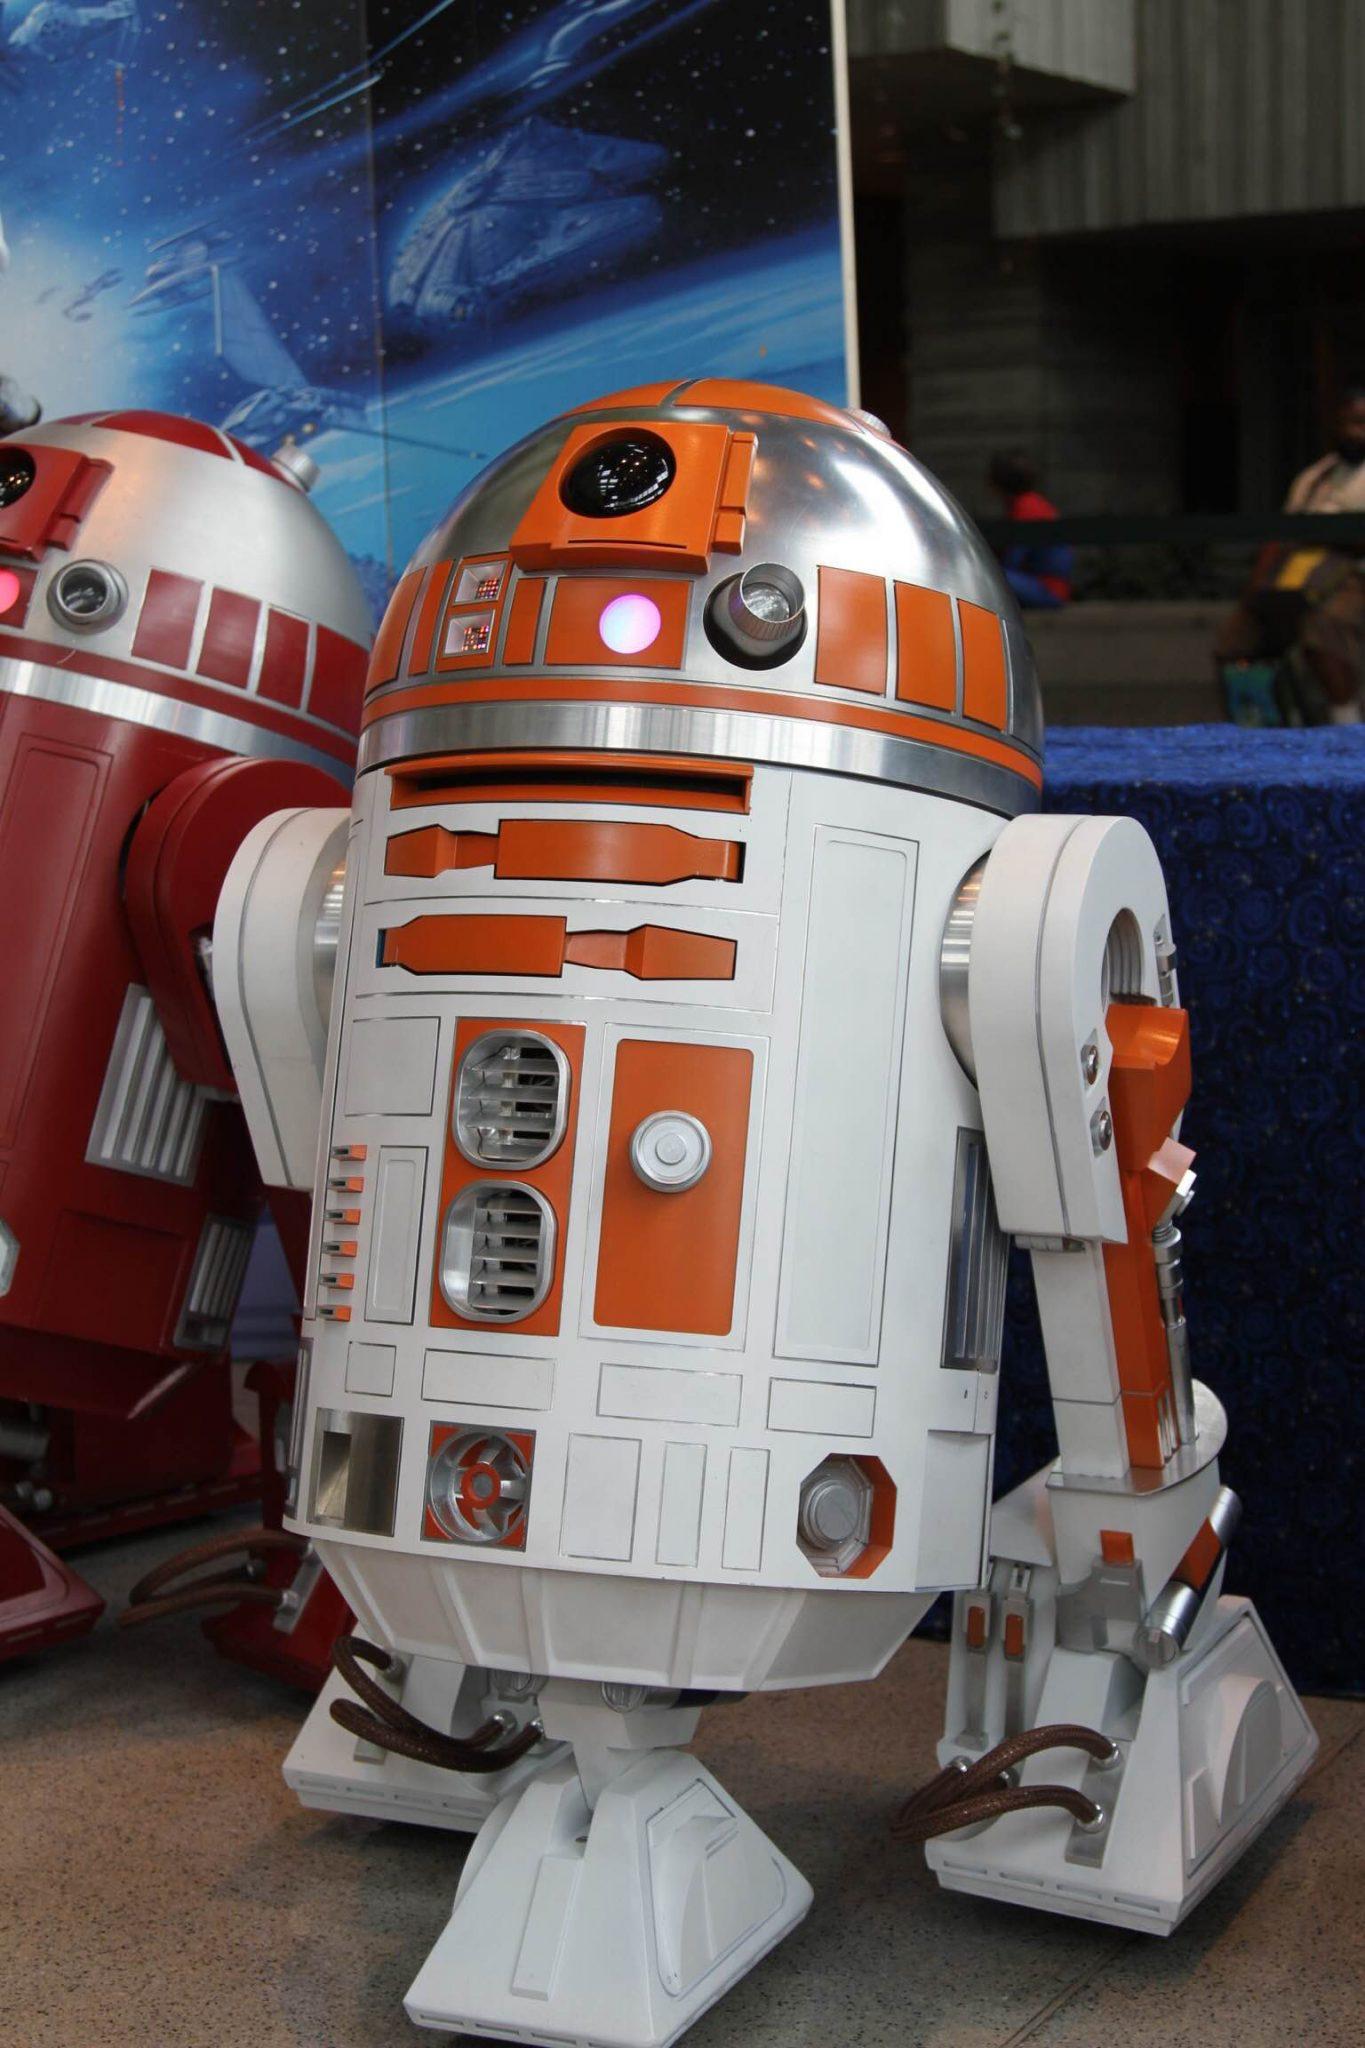 Michael-R2-A2-1